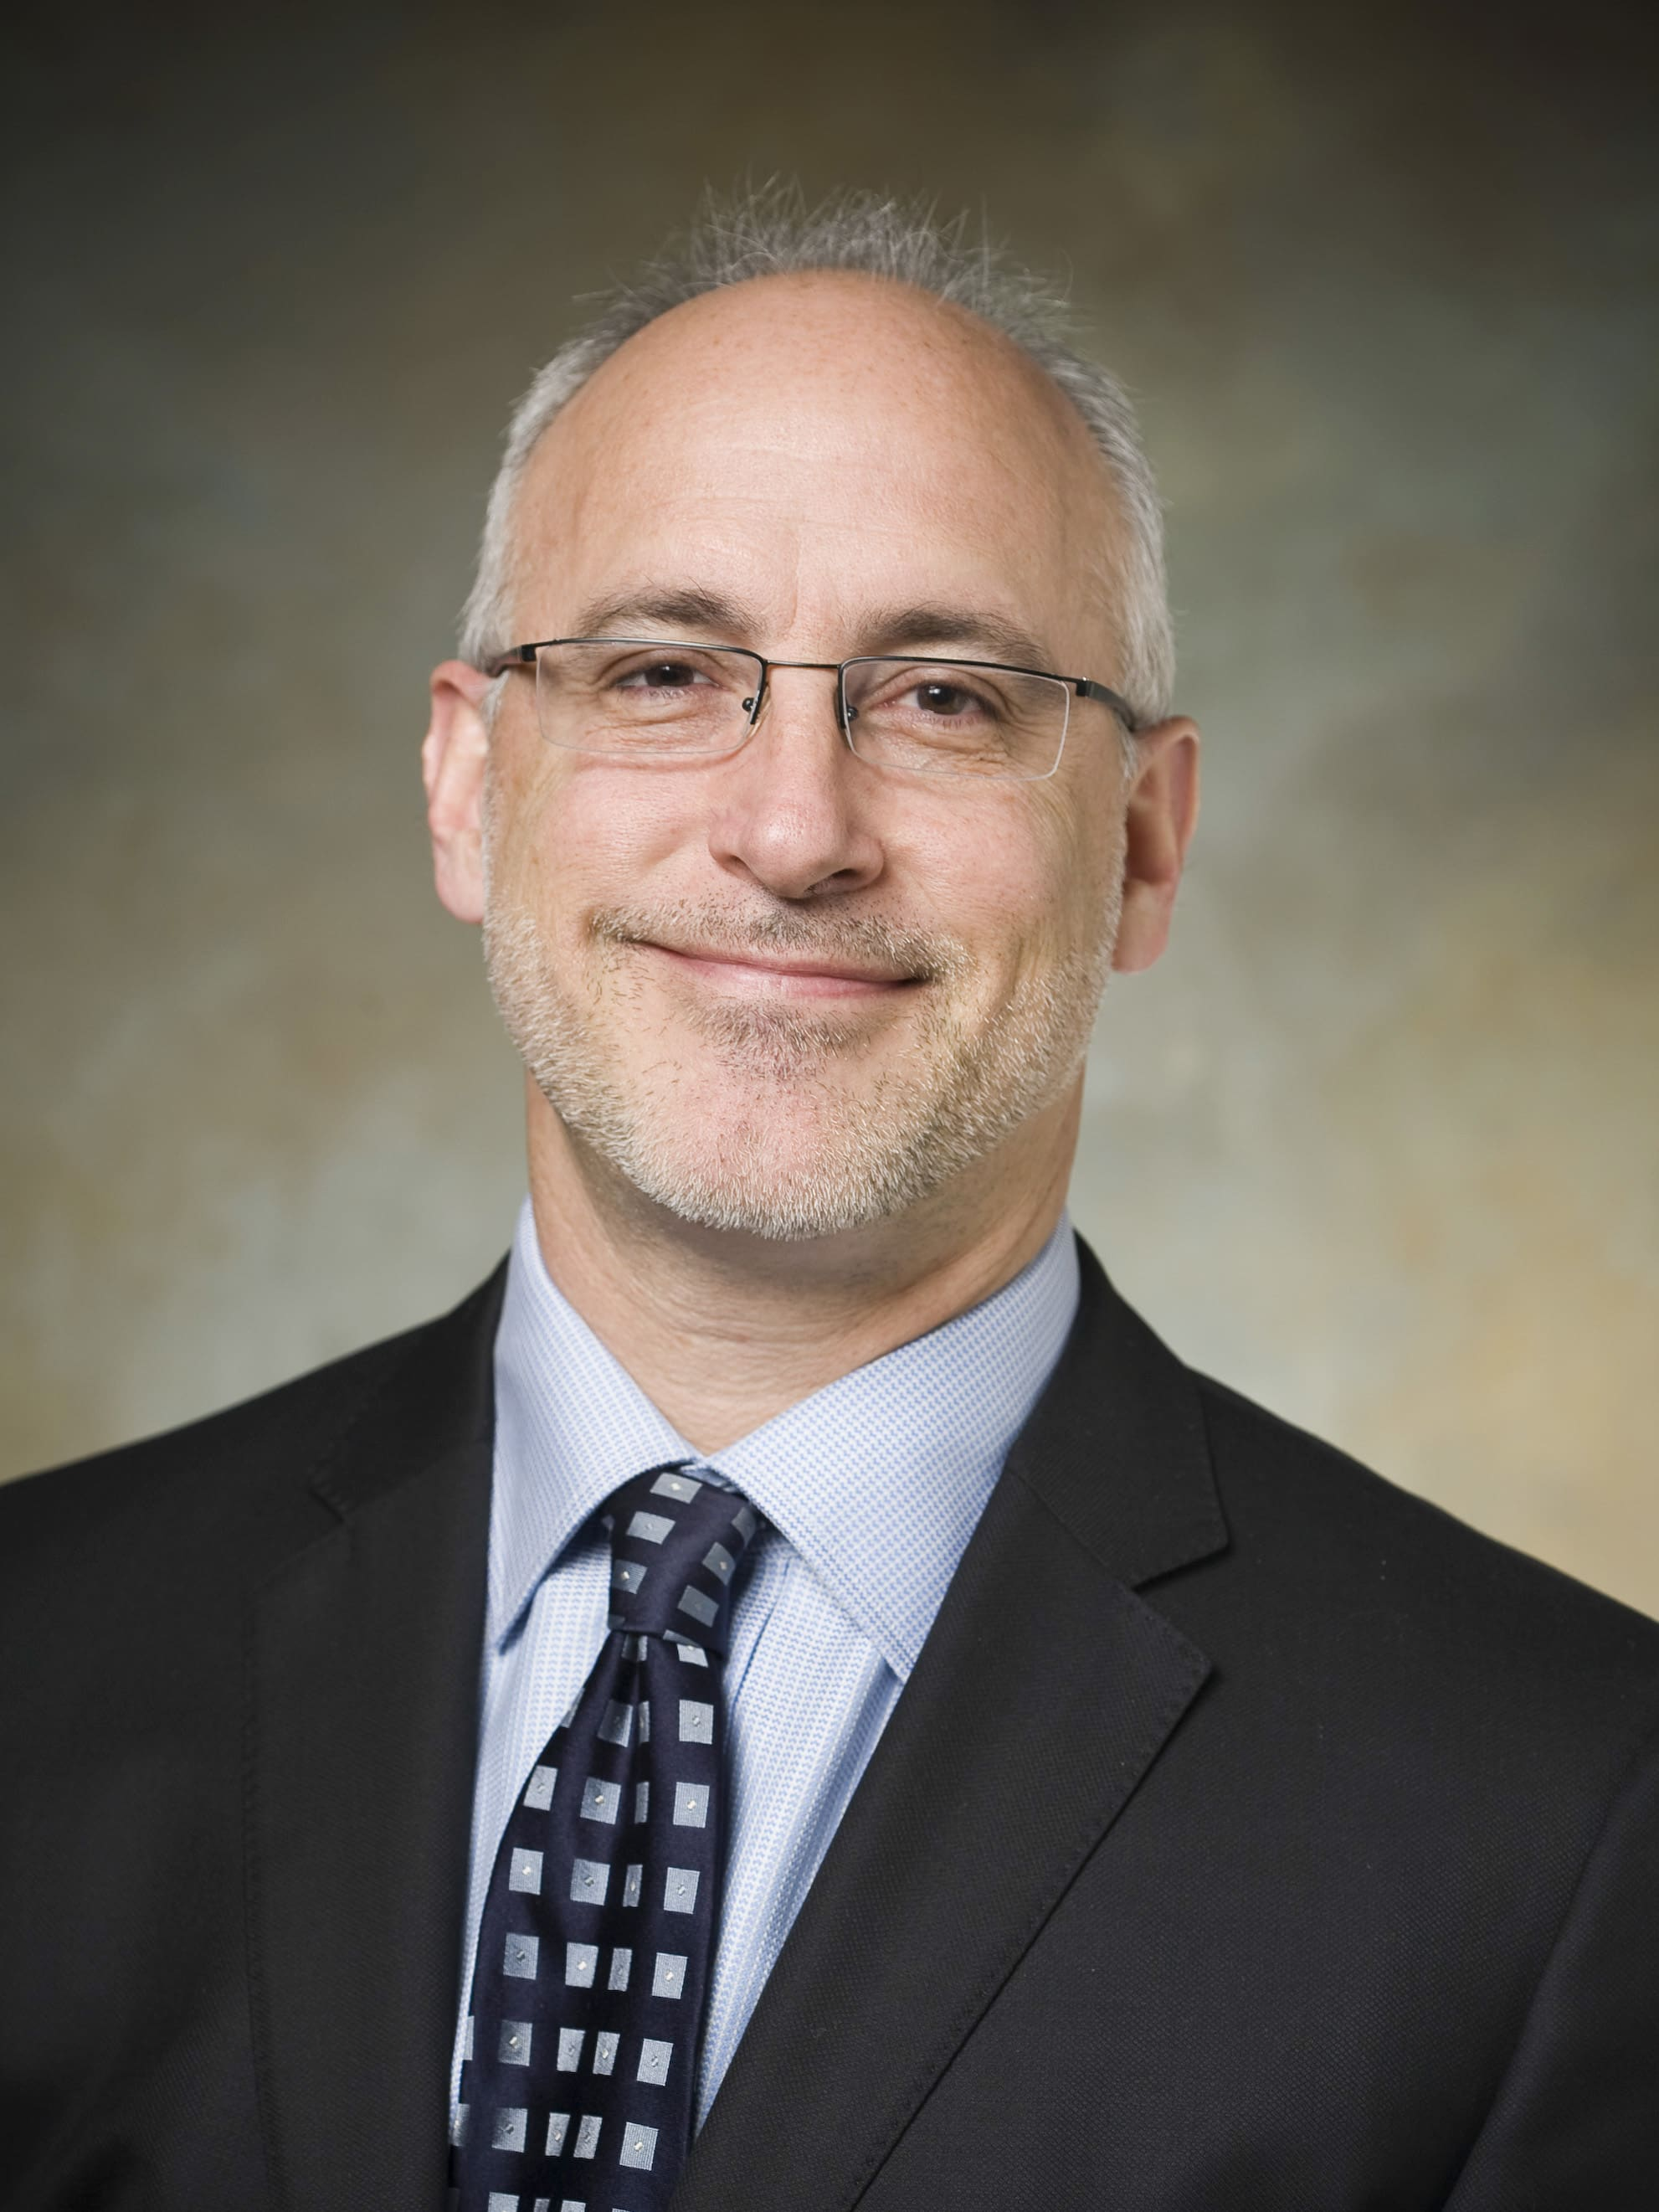 Mark Bianchi